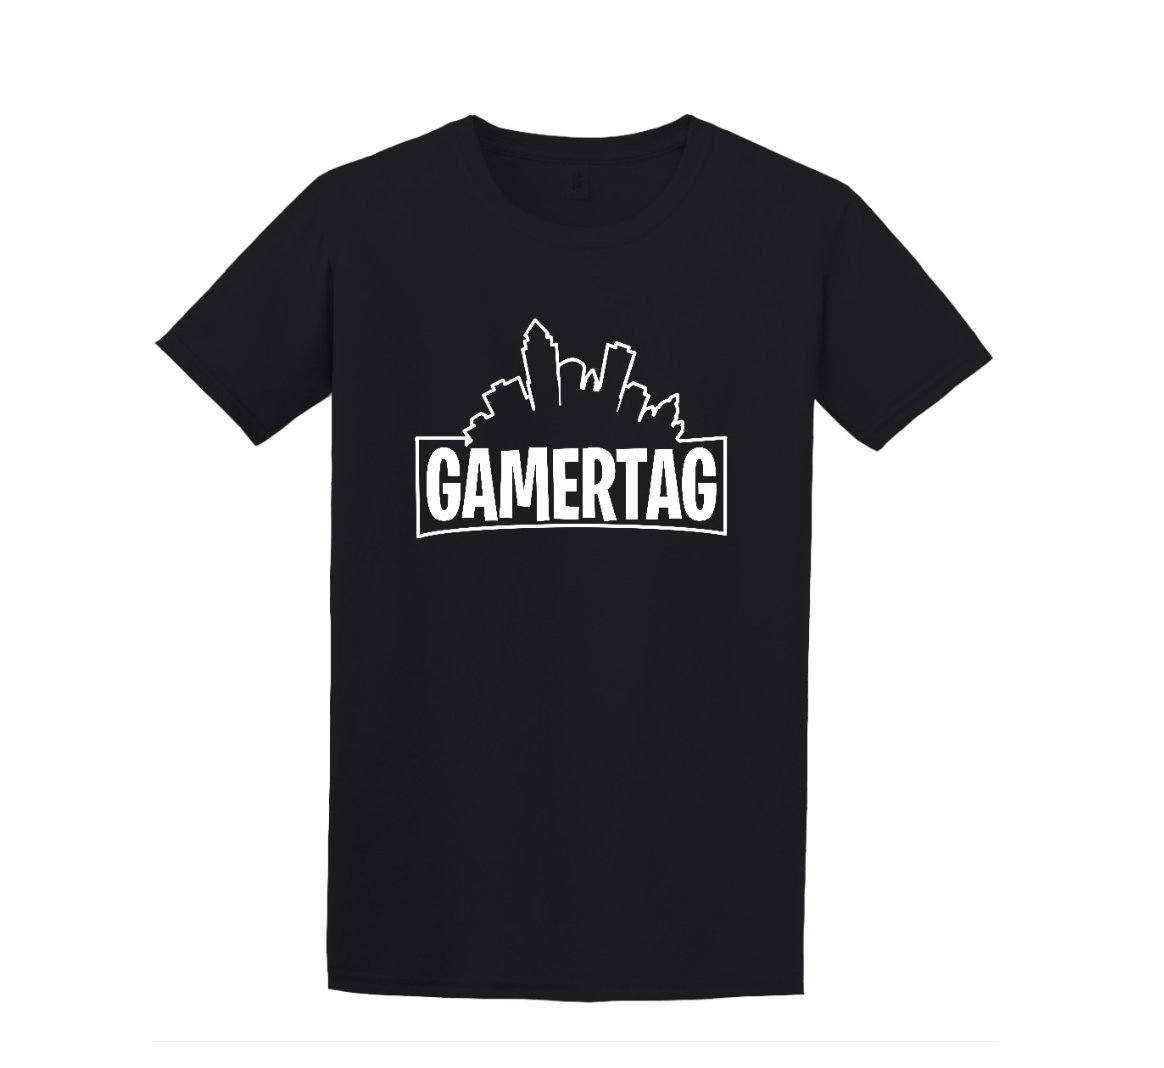 Personalized GAMERTAG Fortnite Inspired - PUBG, Gamer, Geek, Gift for Gamers, Battlegrounds, Fortnight Battle Royale, Cosplay, Costume